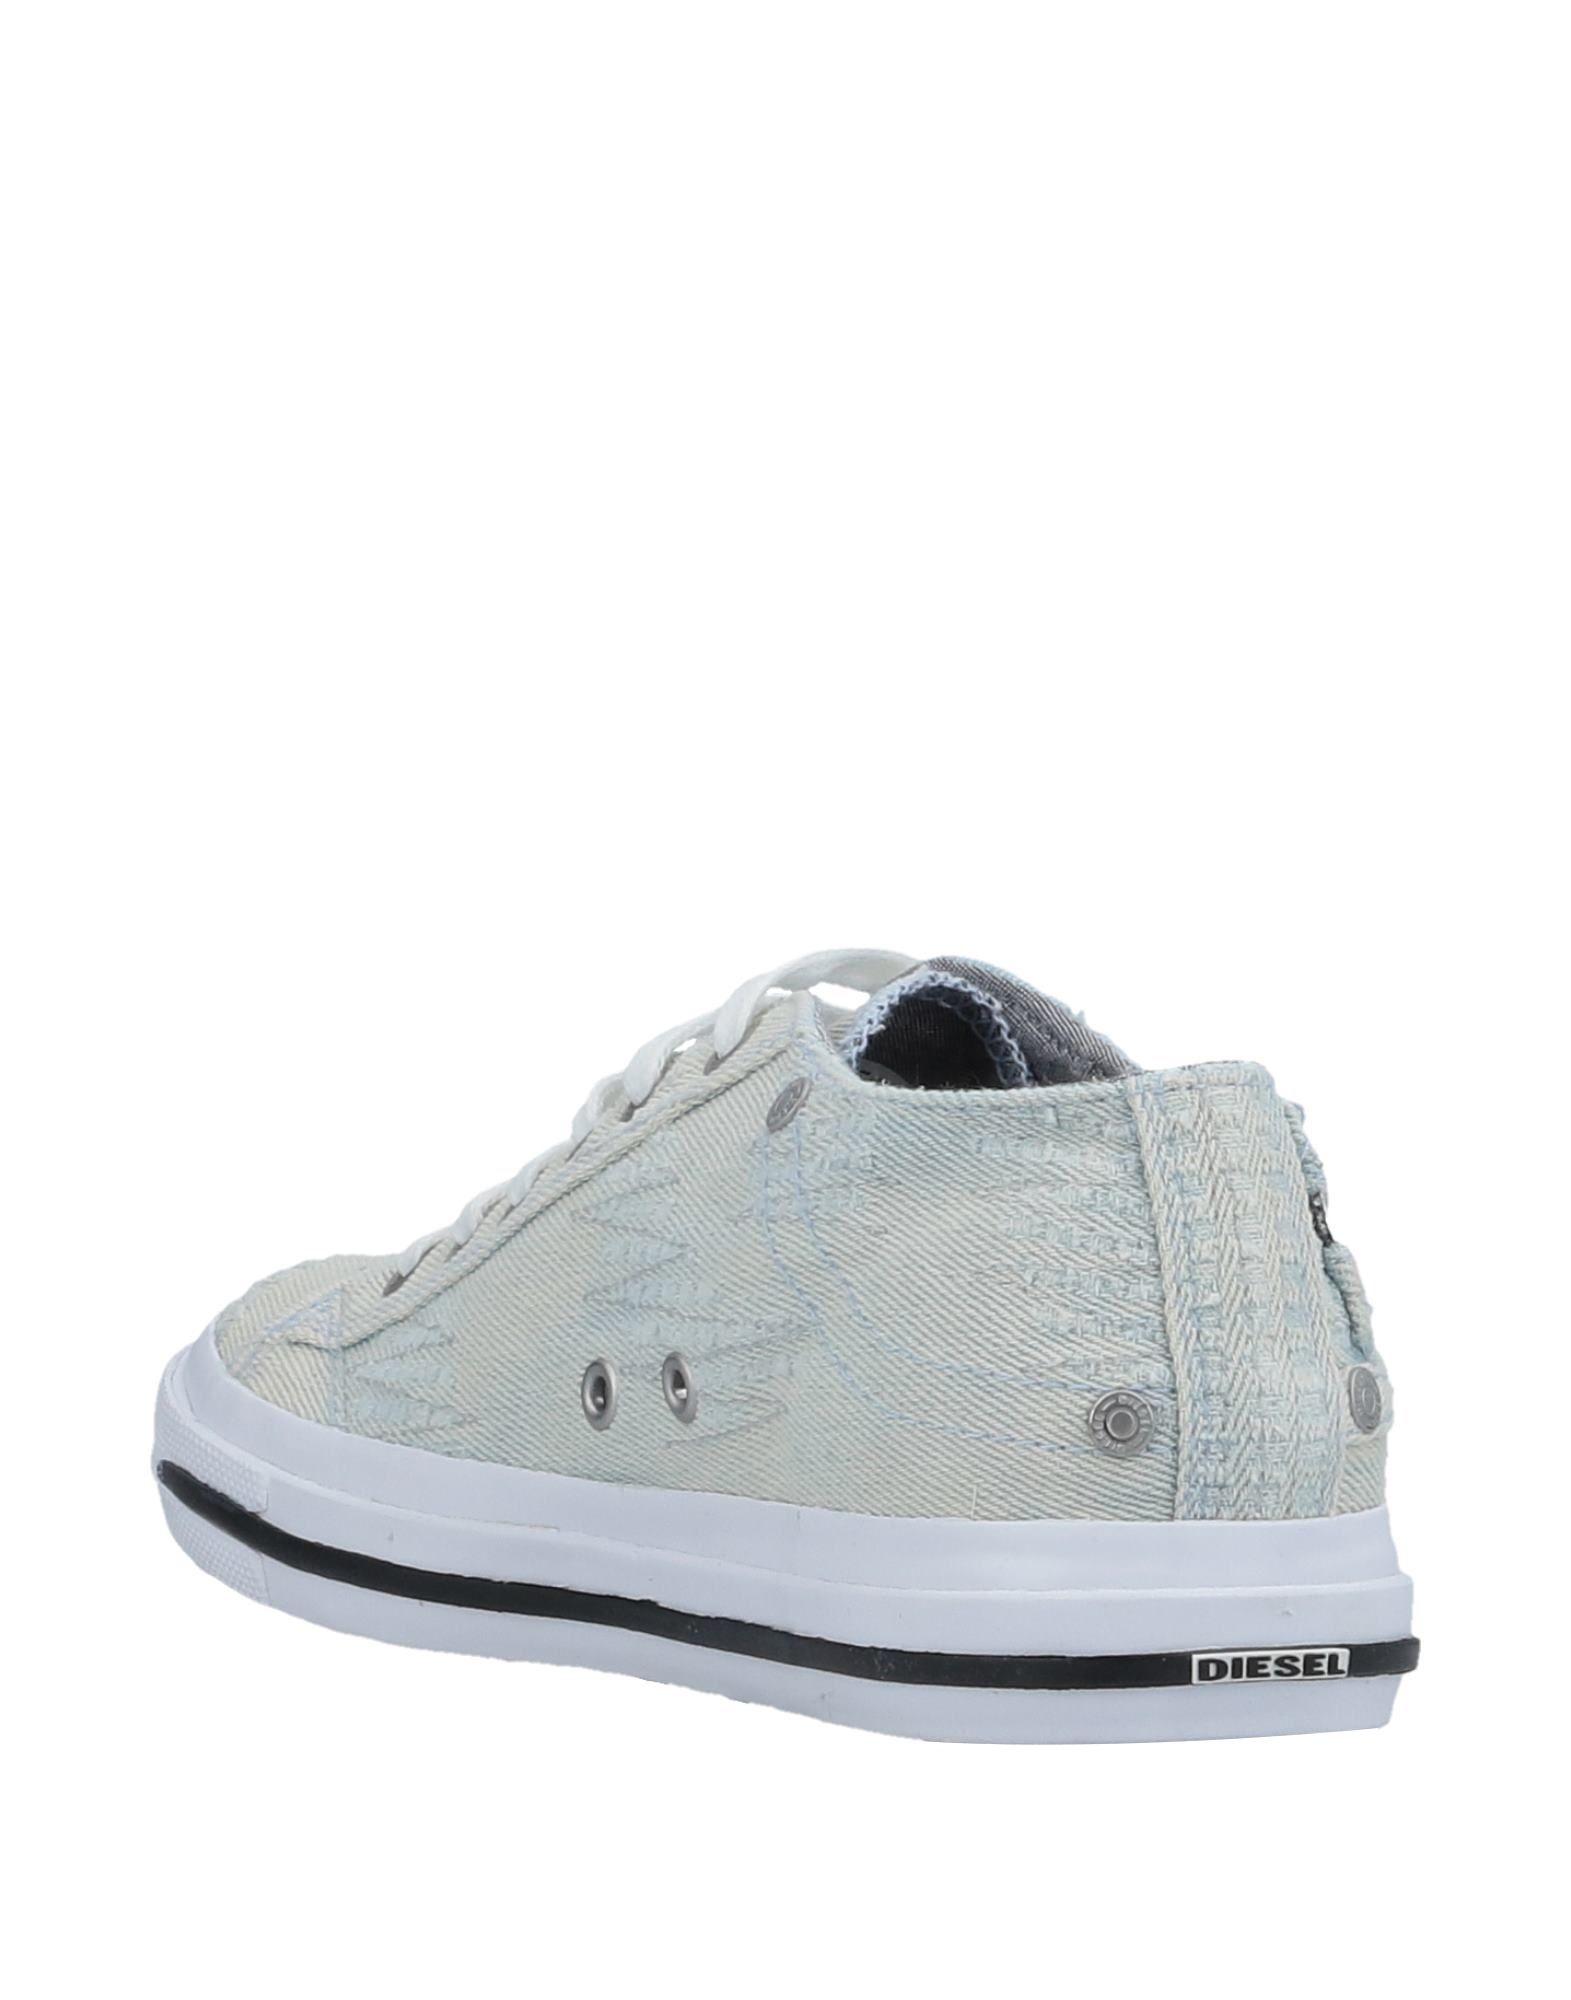 Diesel Sneakers Damen  11511752IW Gute Qualität beliebte Schuhe